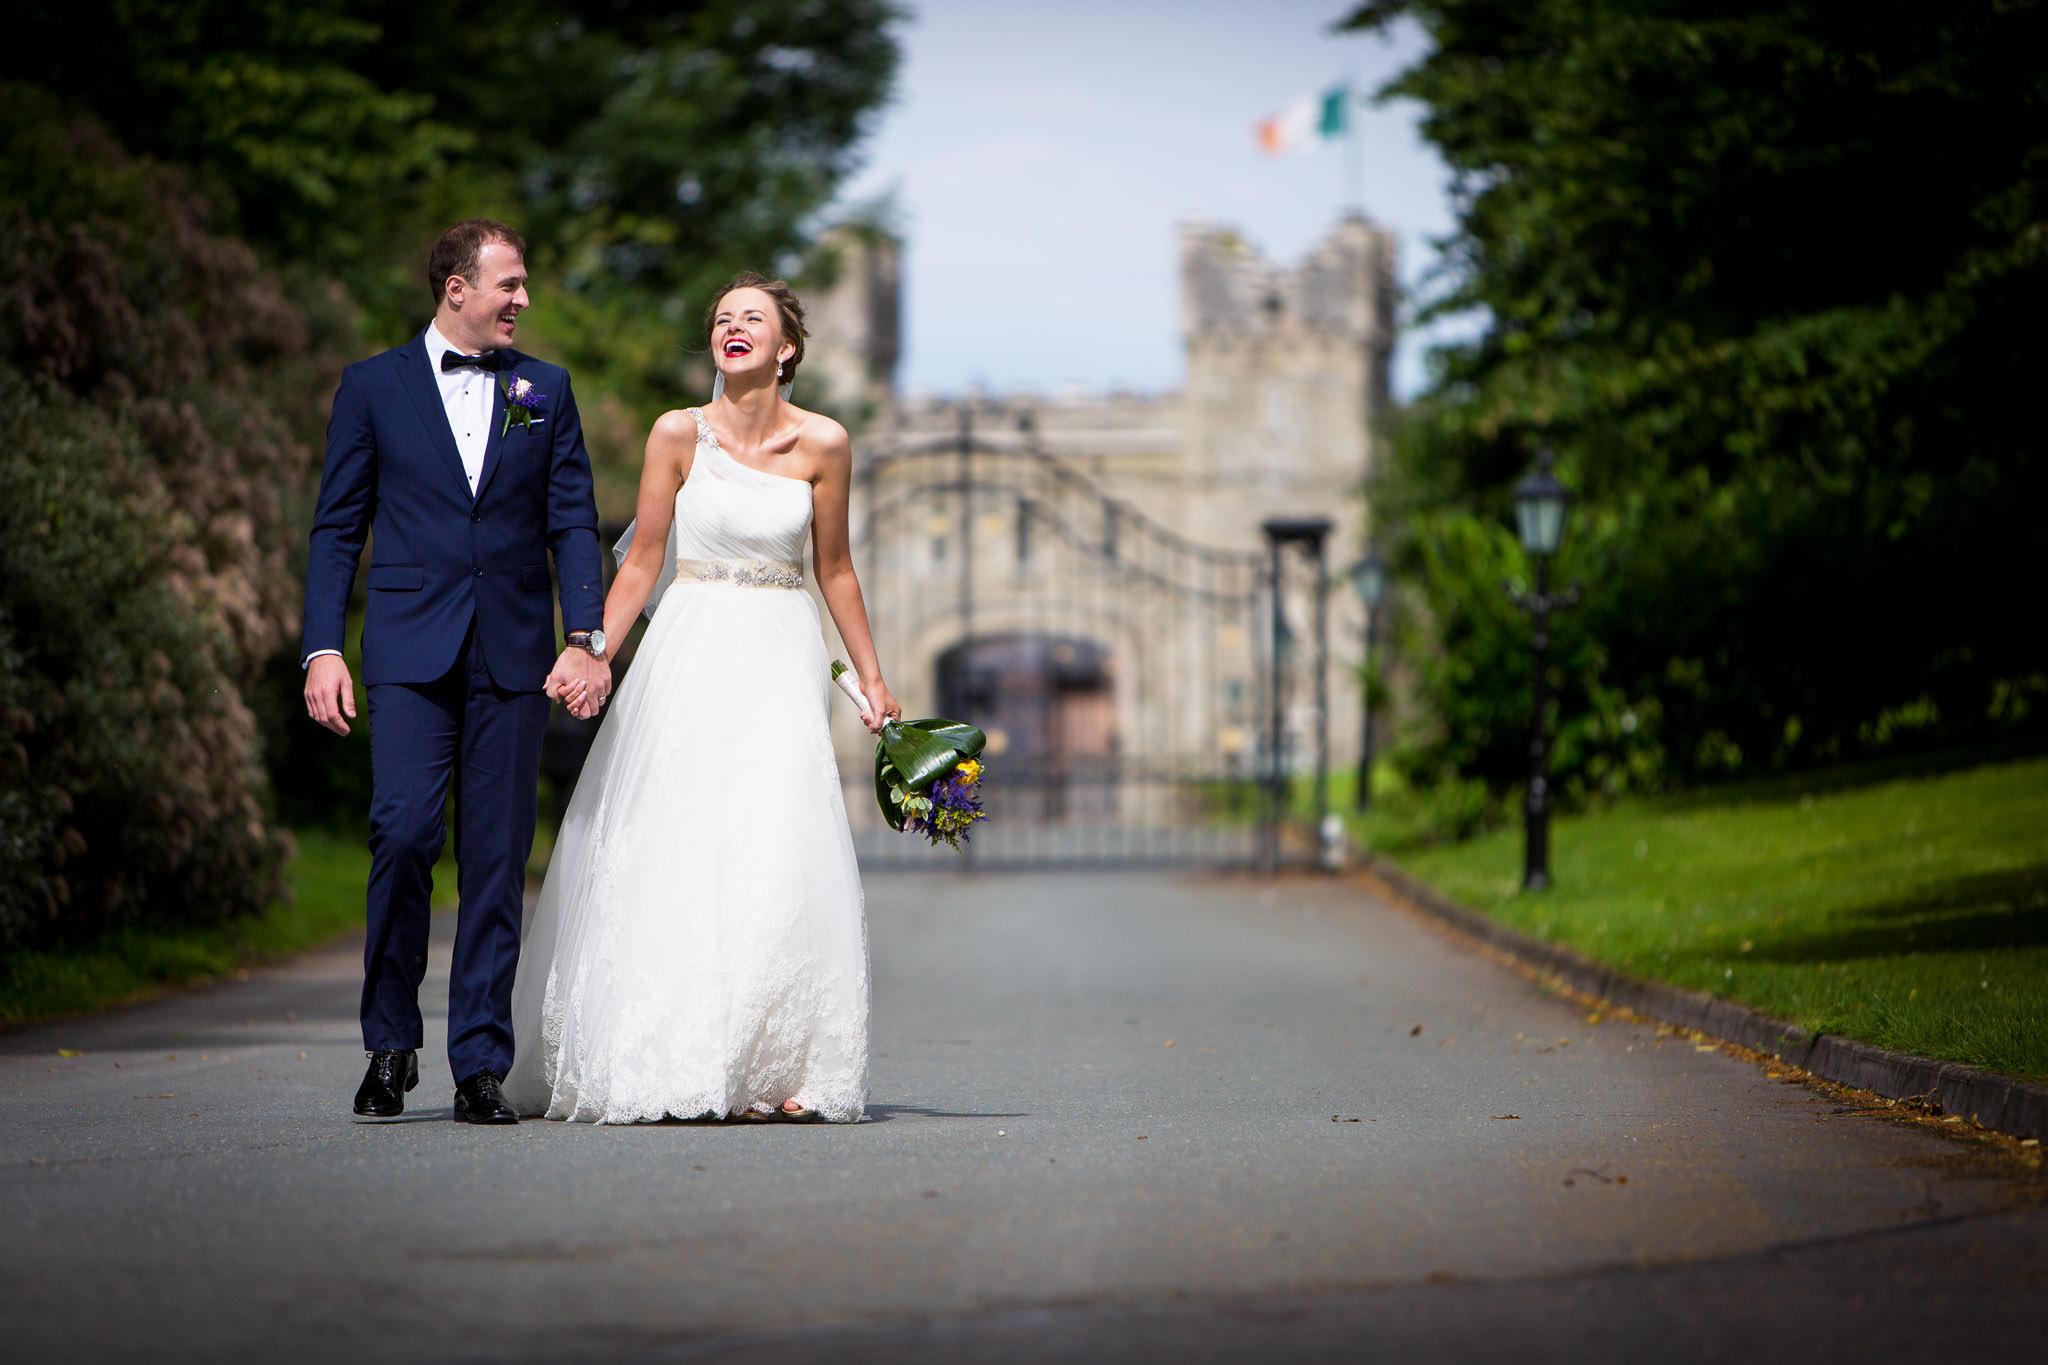 wedding photographers dublin ireland 0678 2